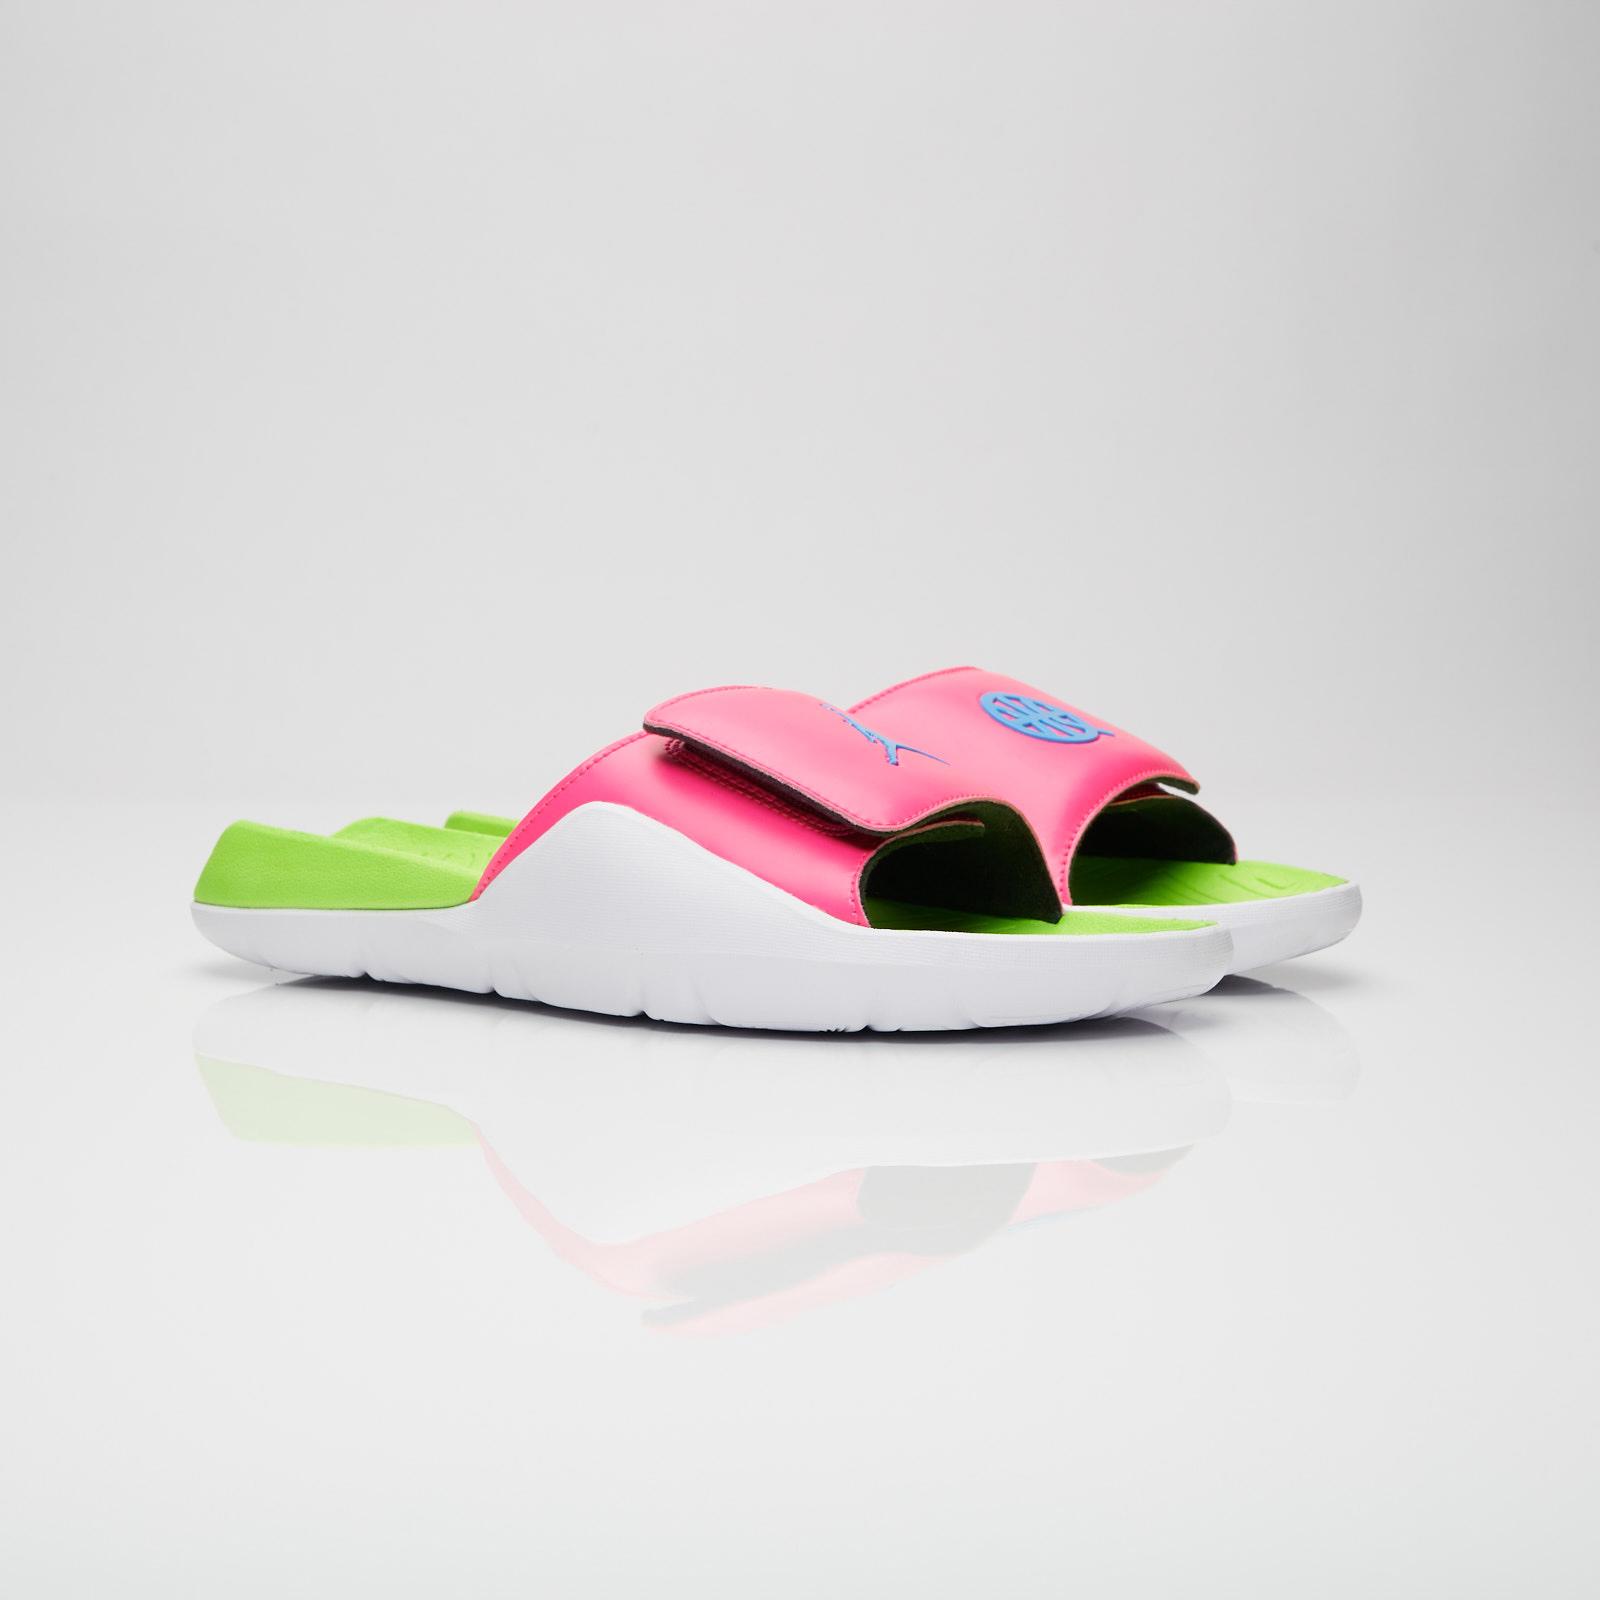 f753b9301b4d Jordan Brand Jordan Hydro 7 Q54 - At9193-600 - Sneakersnstuff ...